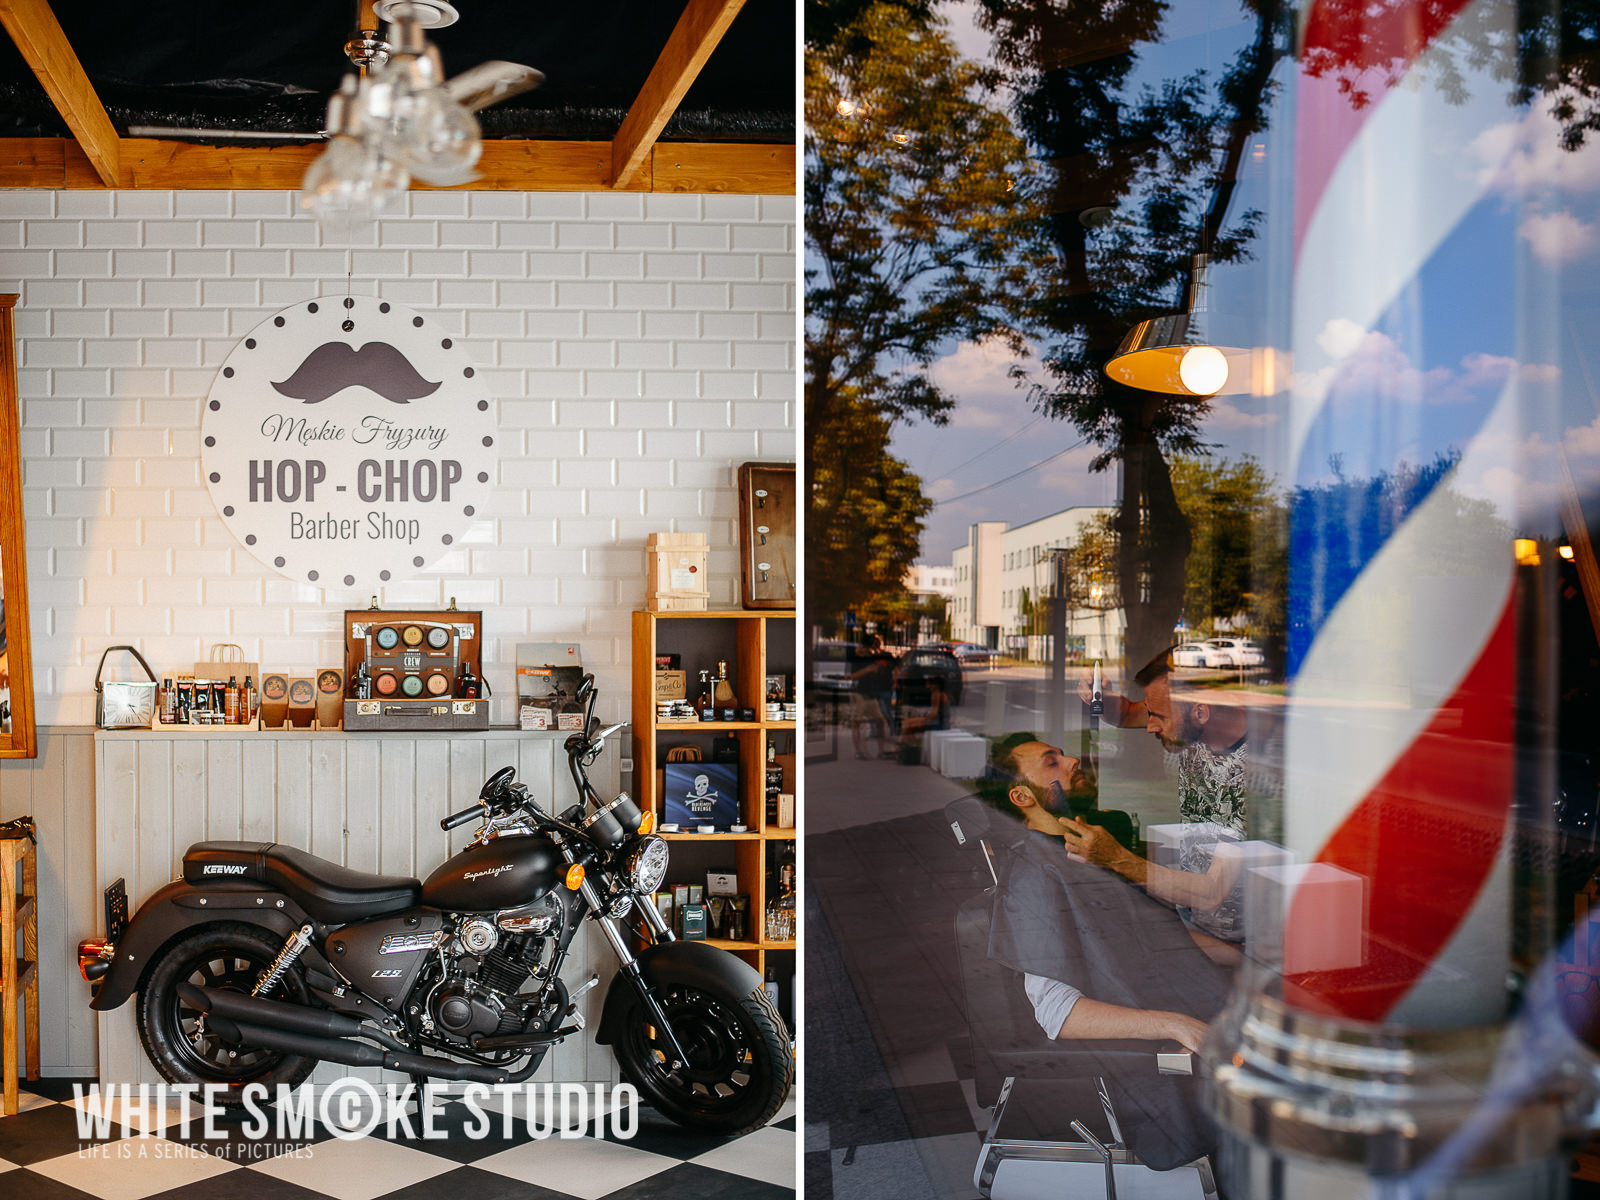 Kasia_Artur_003_hopchop_barbershop